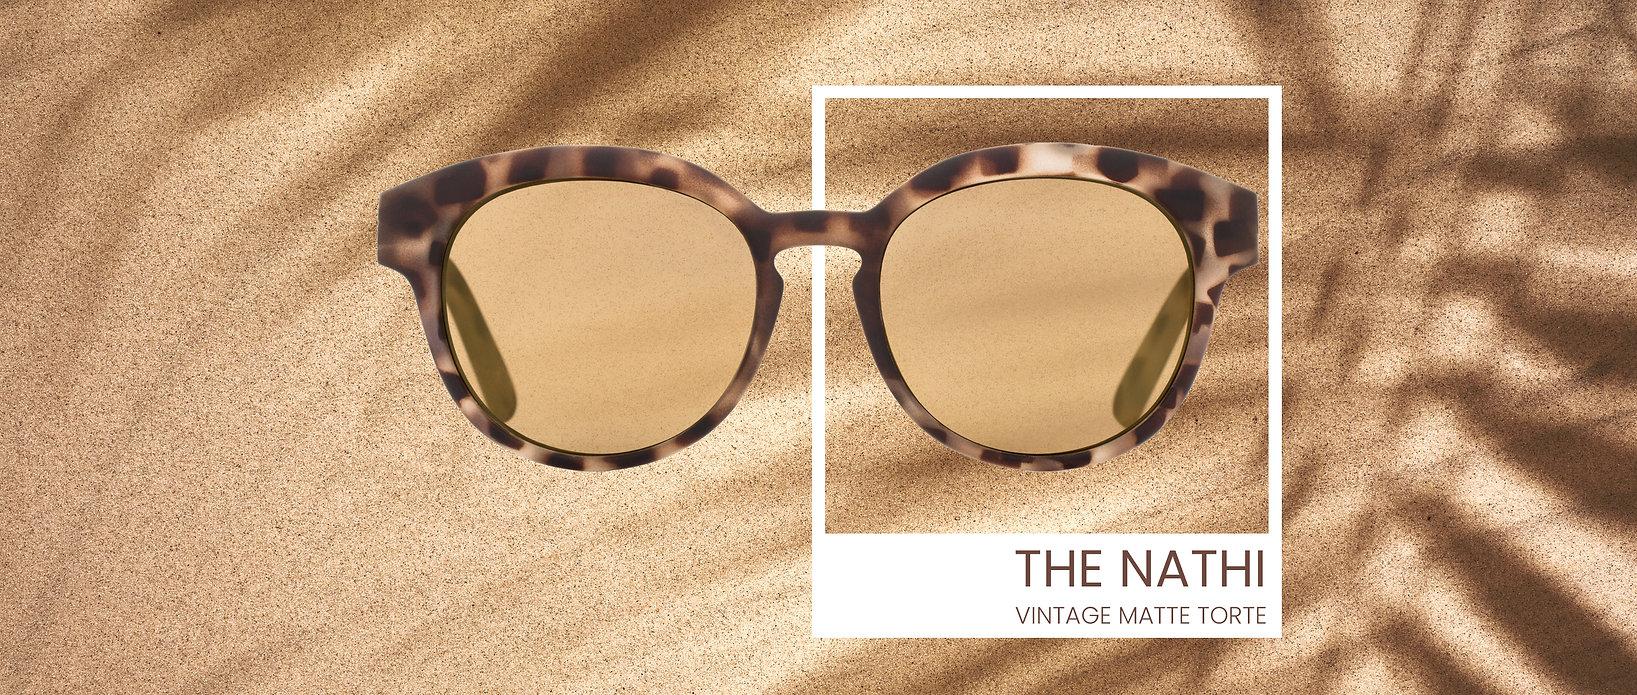 us-eyewear-product-banner_Nathi01.jpg